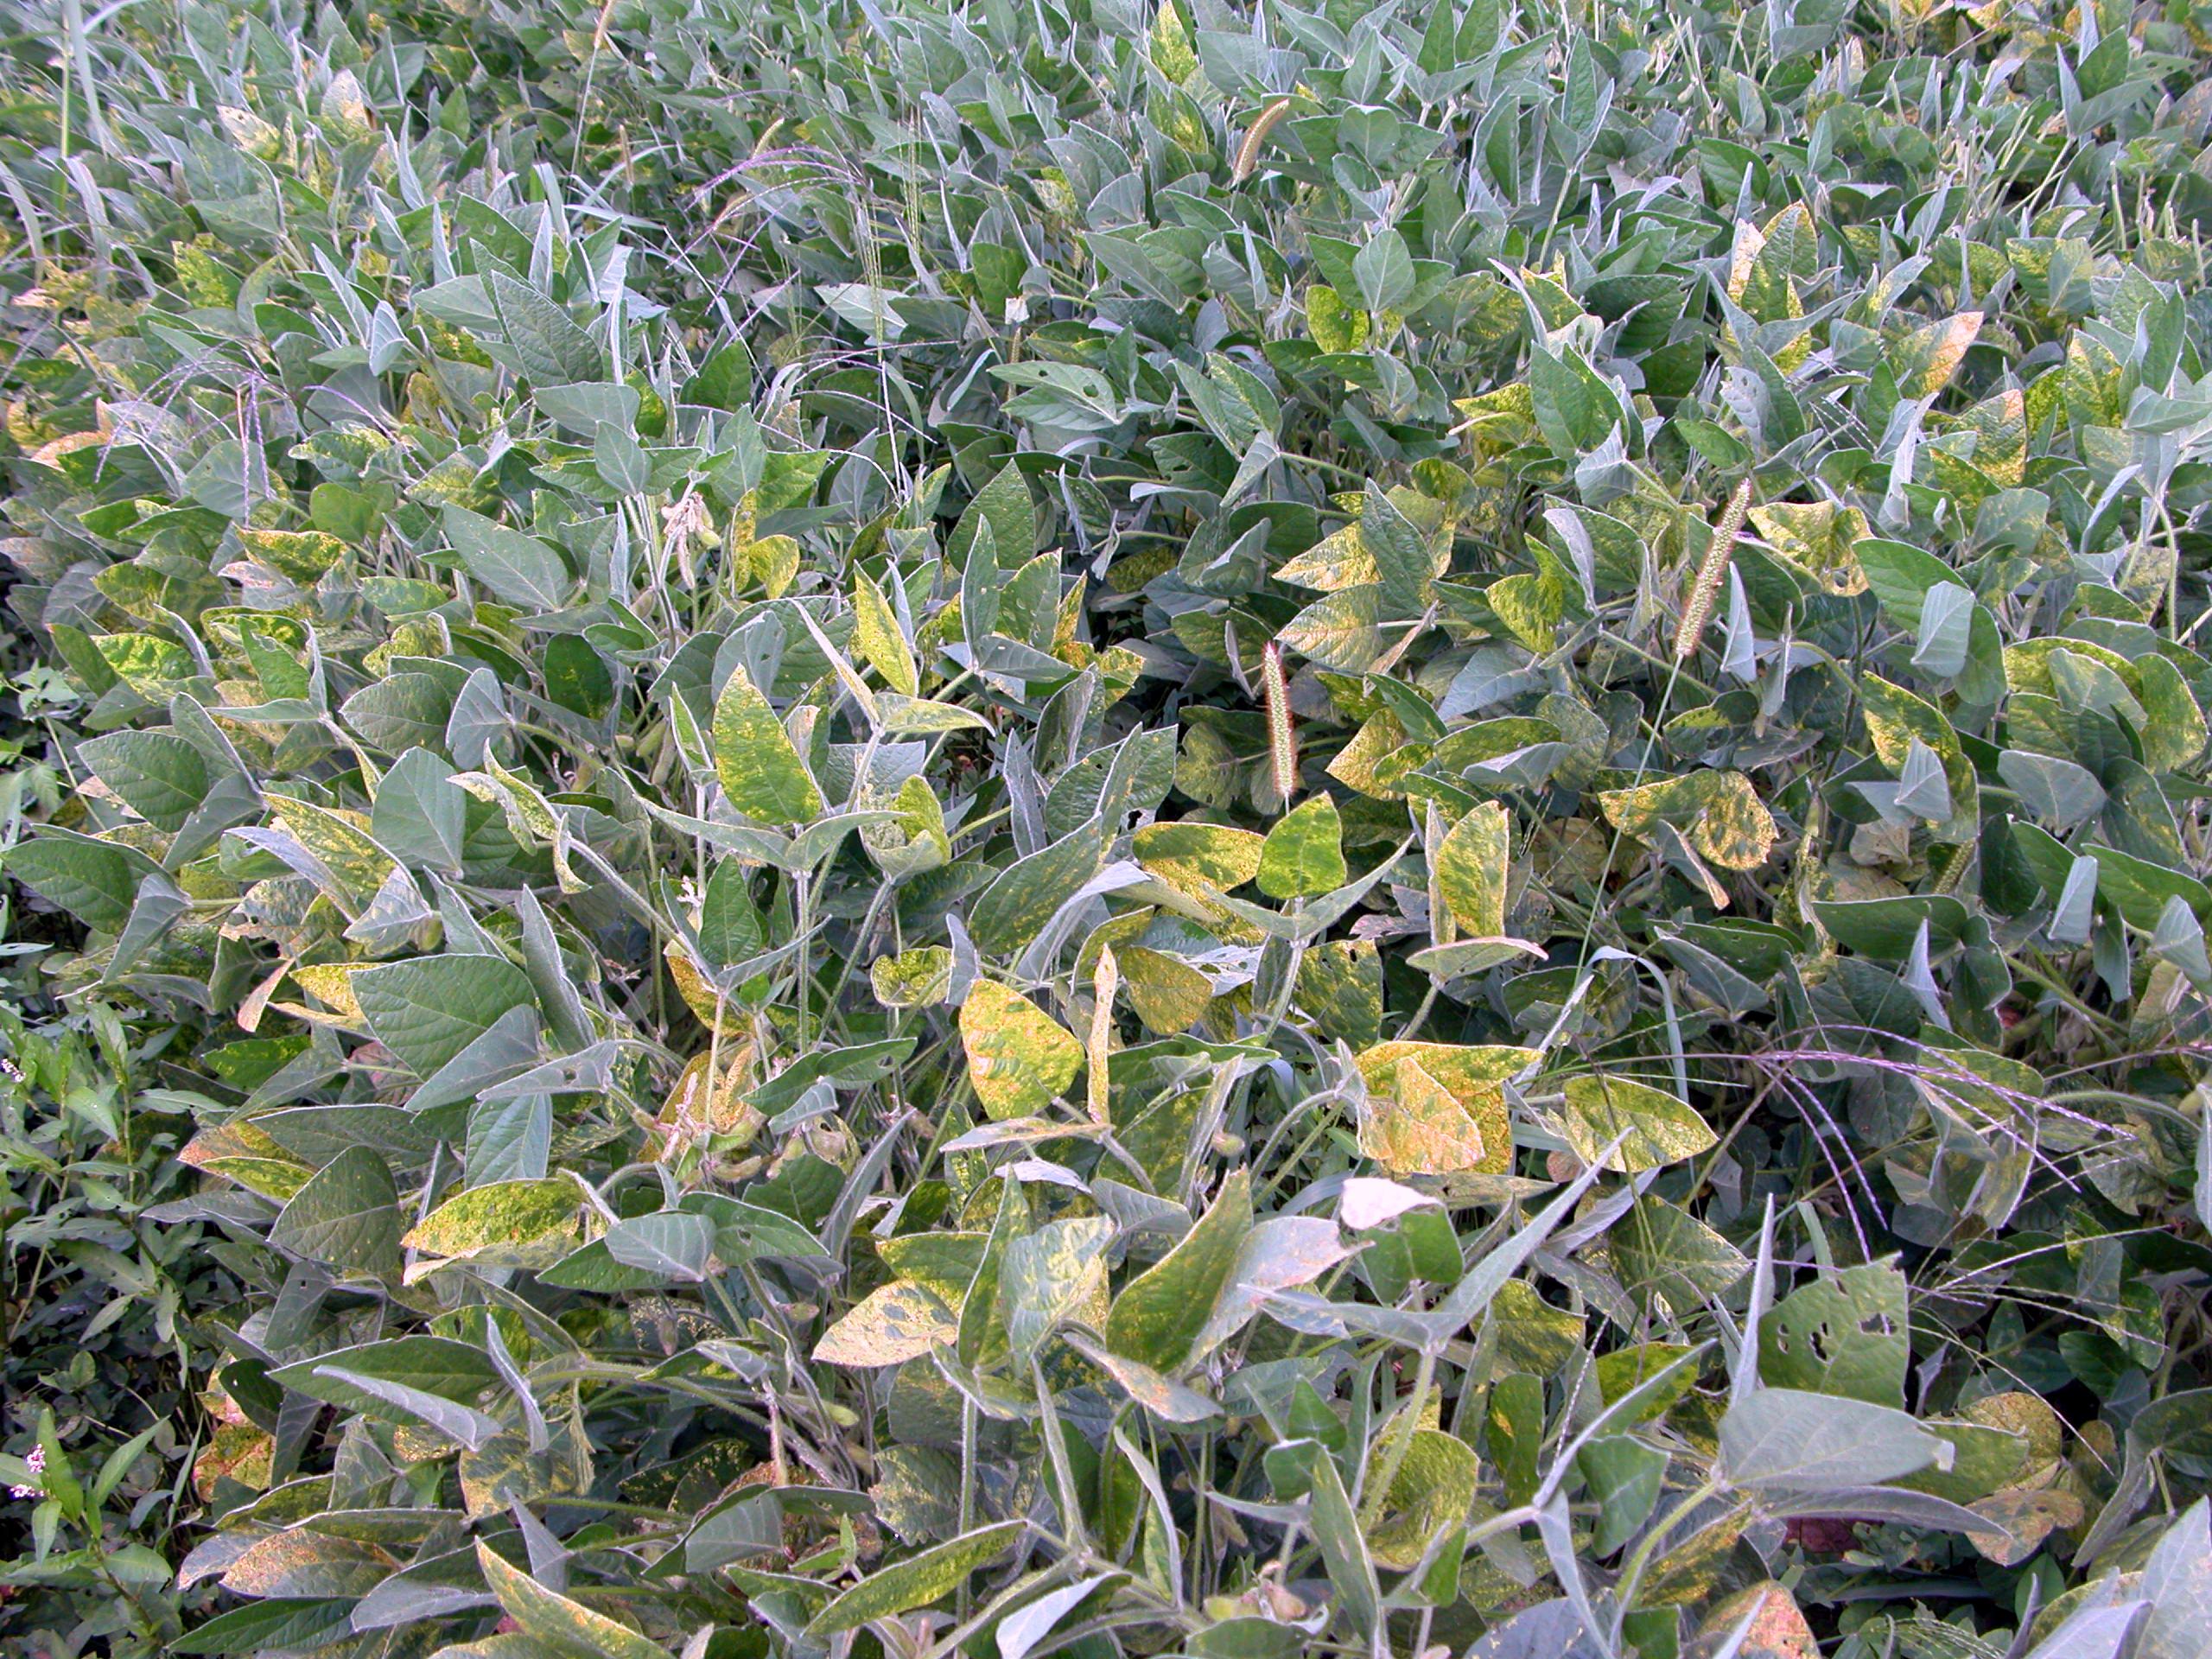 Soybean plants with symptoms of alfalfa mosaic.